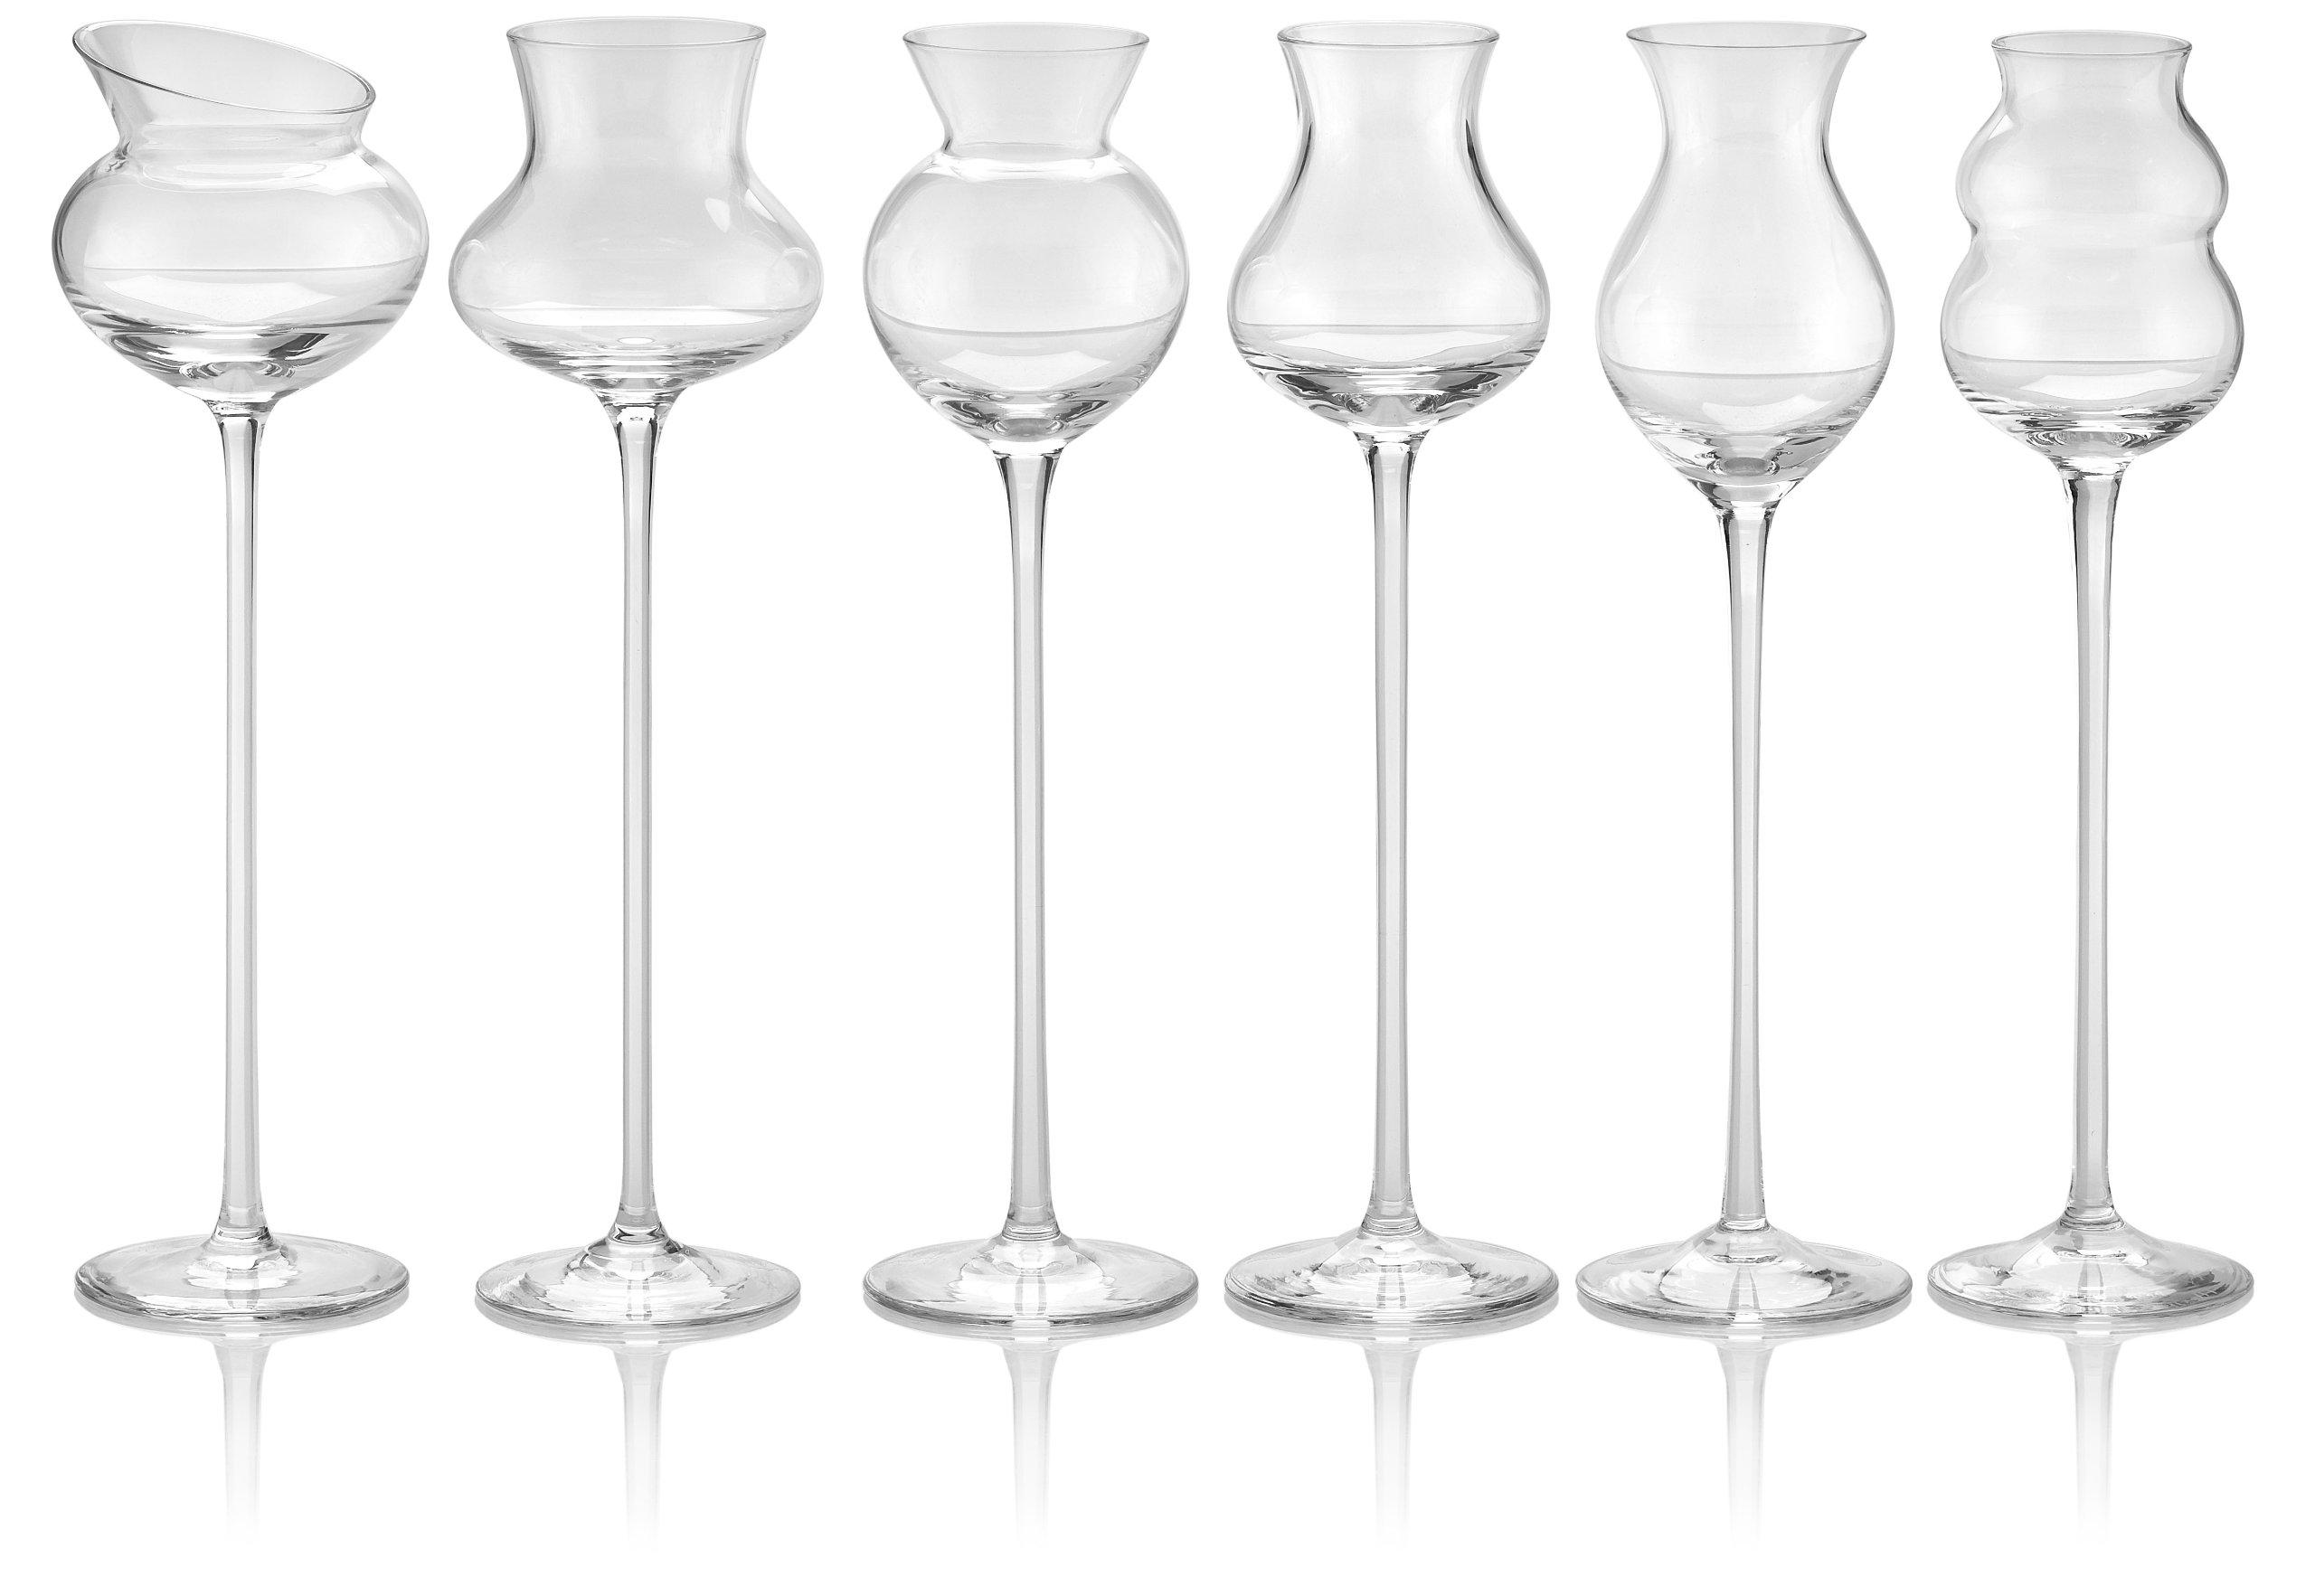 IVV Glassware Distillati Goblets Assorted, Clear, Set of 6